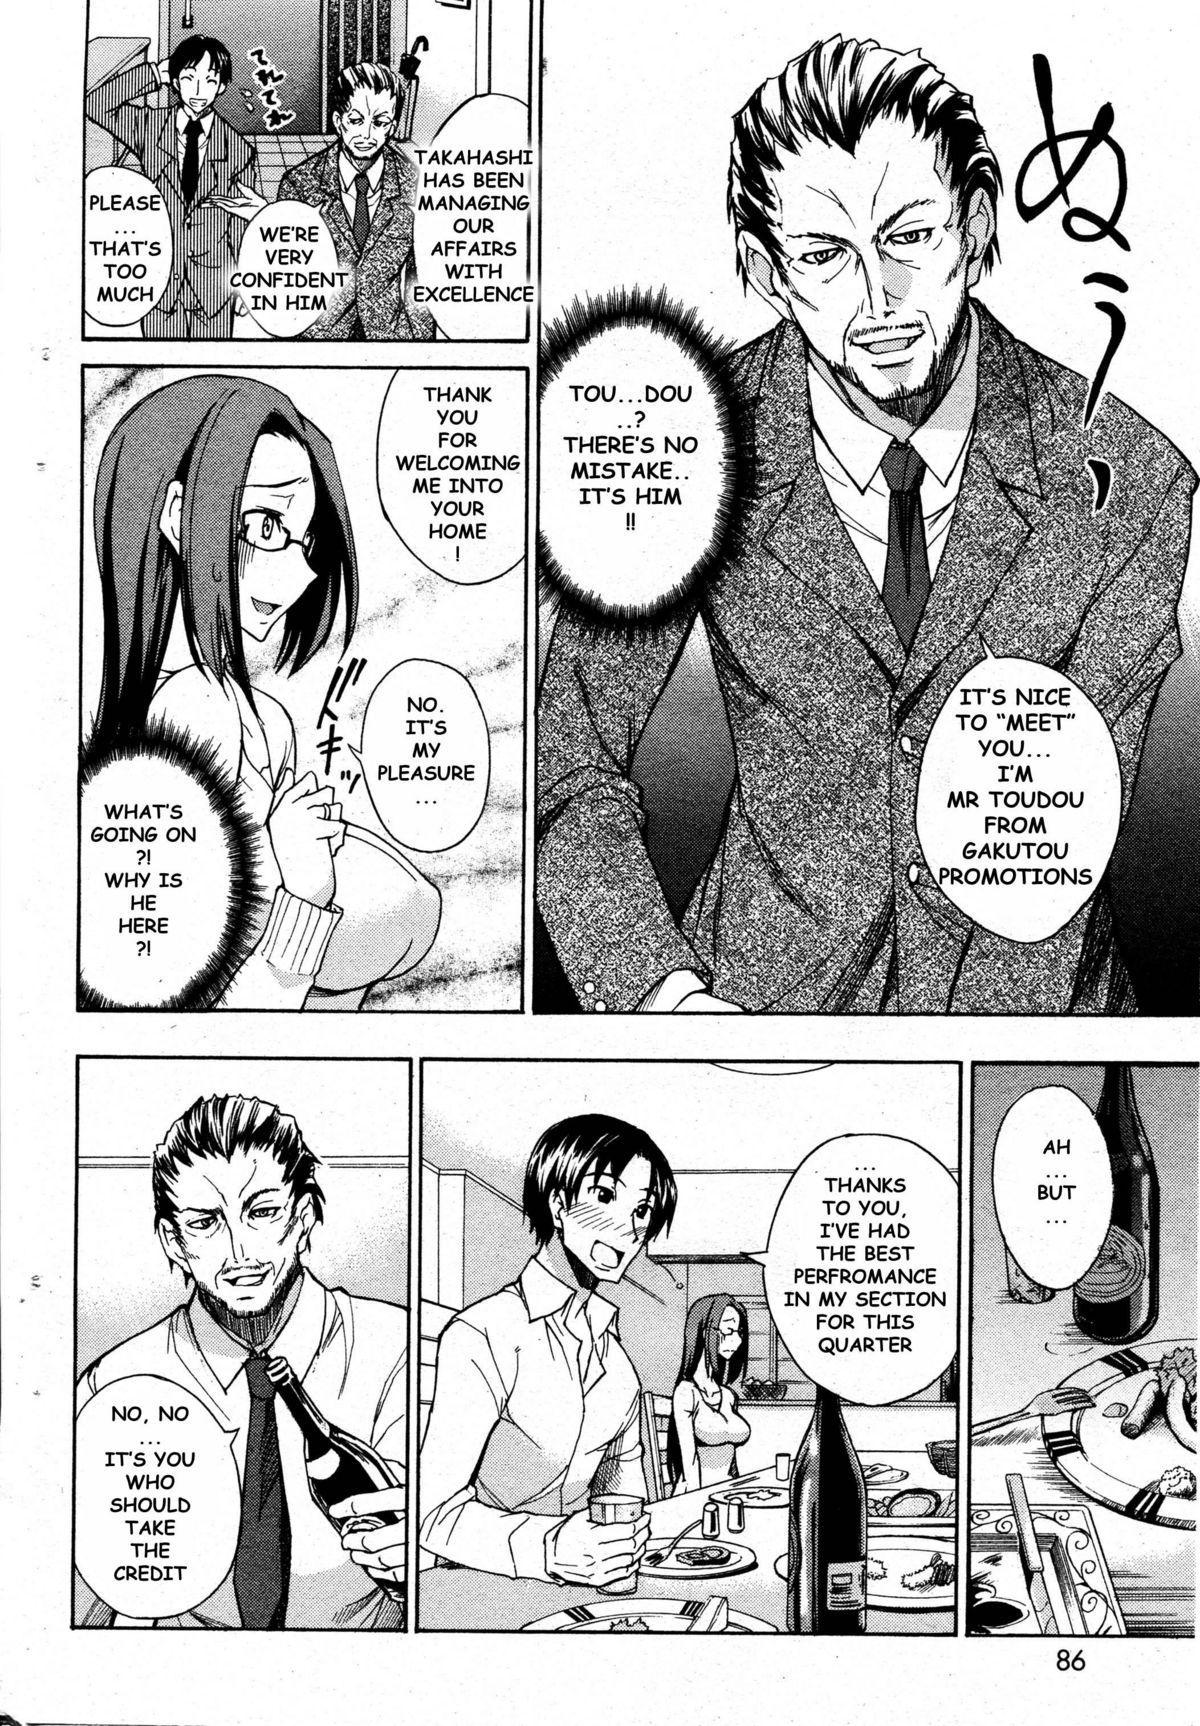 Okusan no Himitsu | A Wife's Secret 3